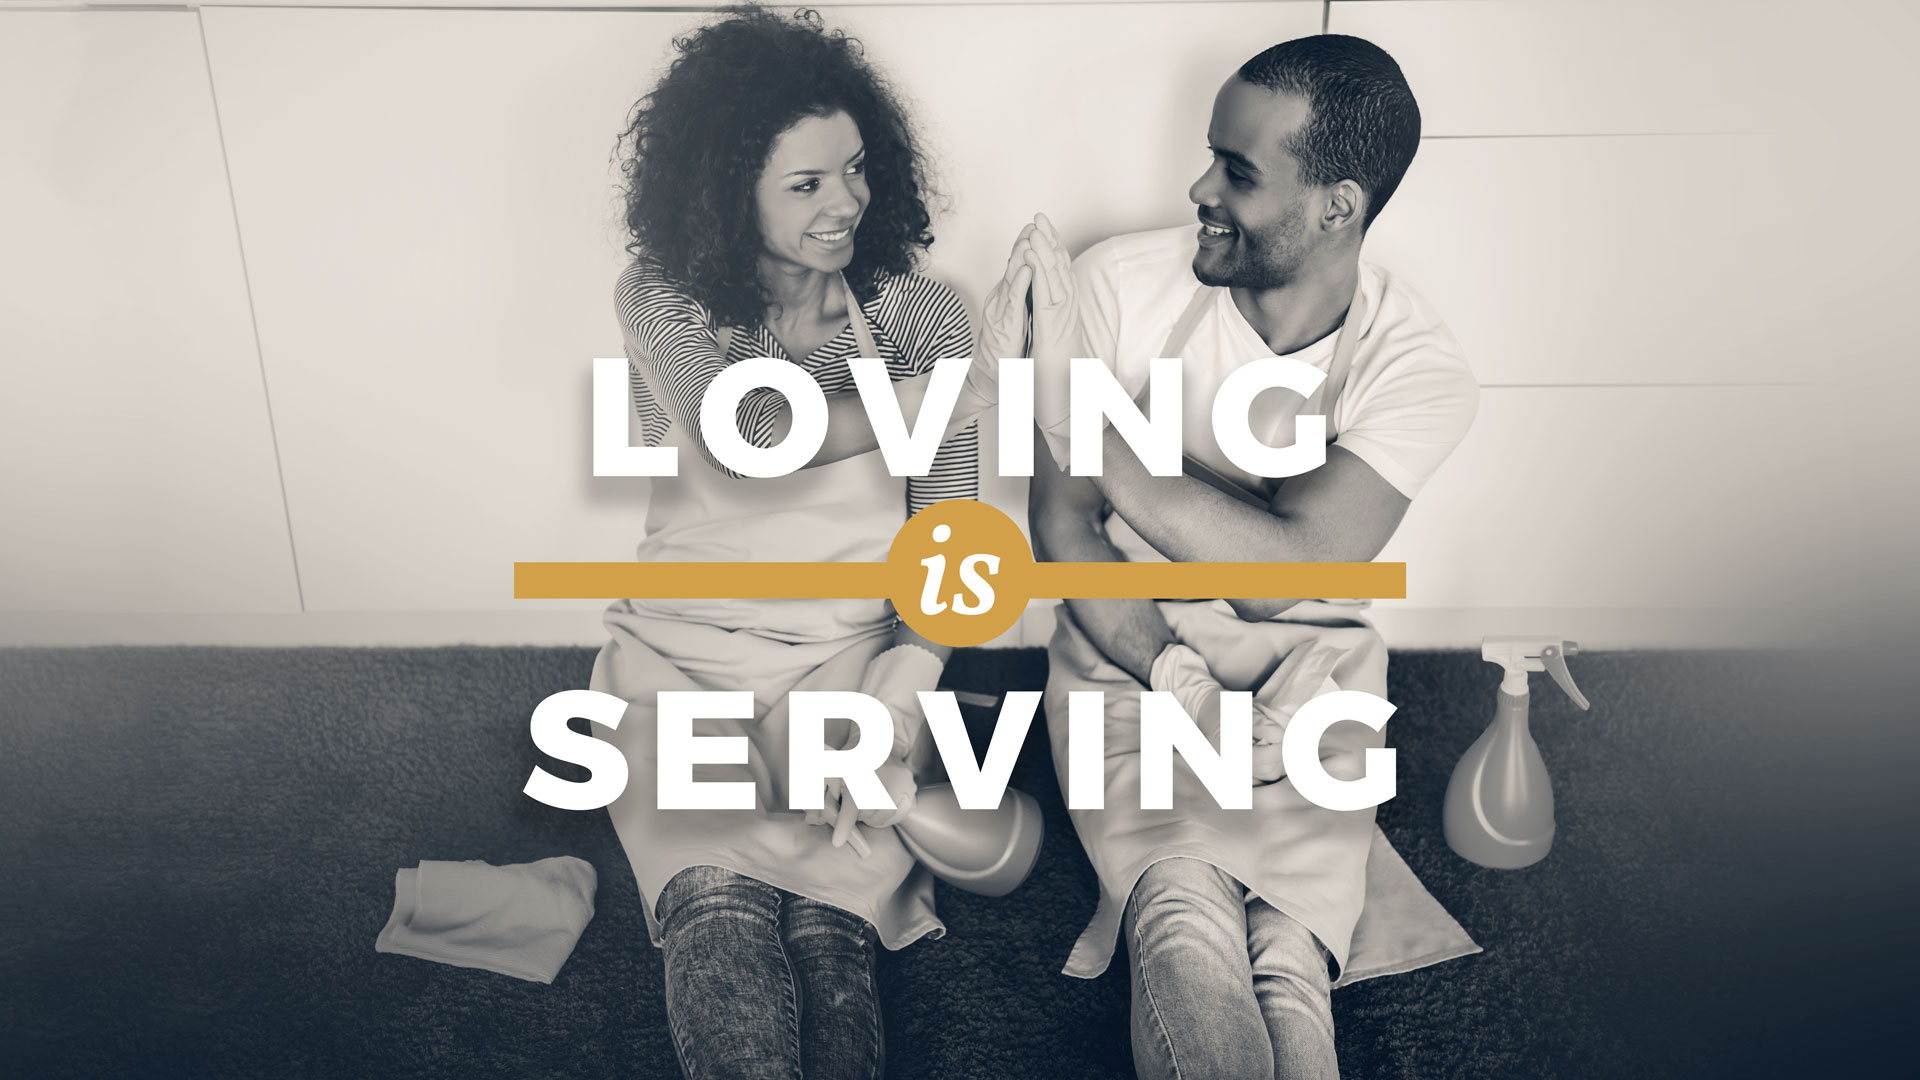 loving-is-serving-title.jpg